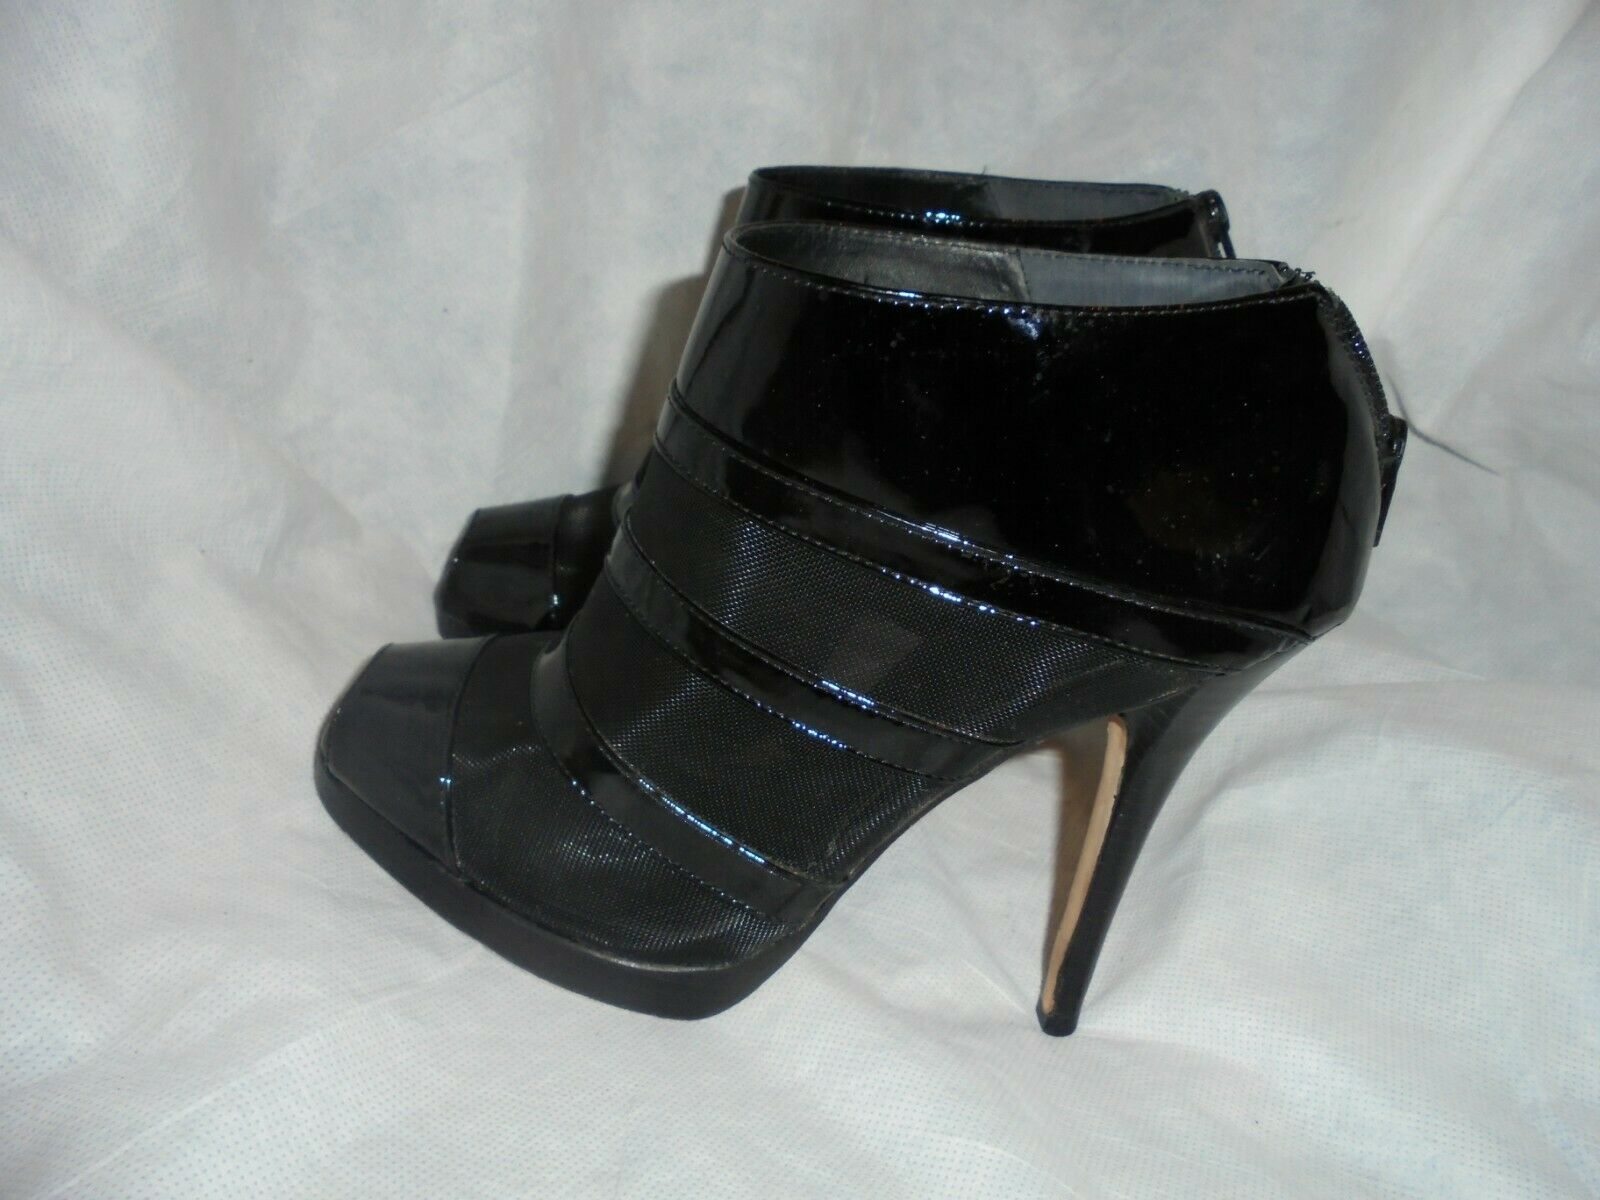 KATE KUBA LADIES schwarz LEATHER RUBBER ZIP UP PEEP ANKLE Stiefel Größe UK 7 EU 40 VGC